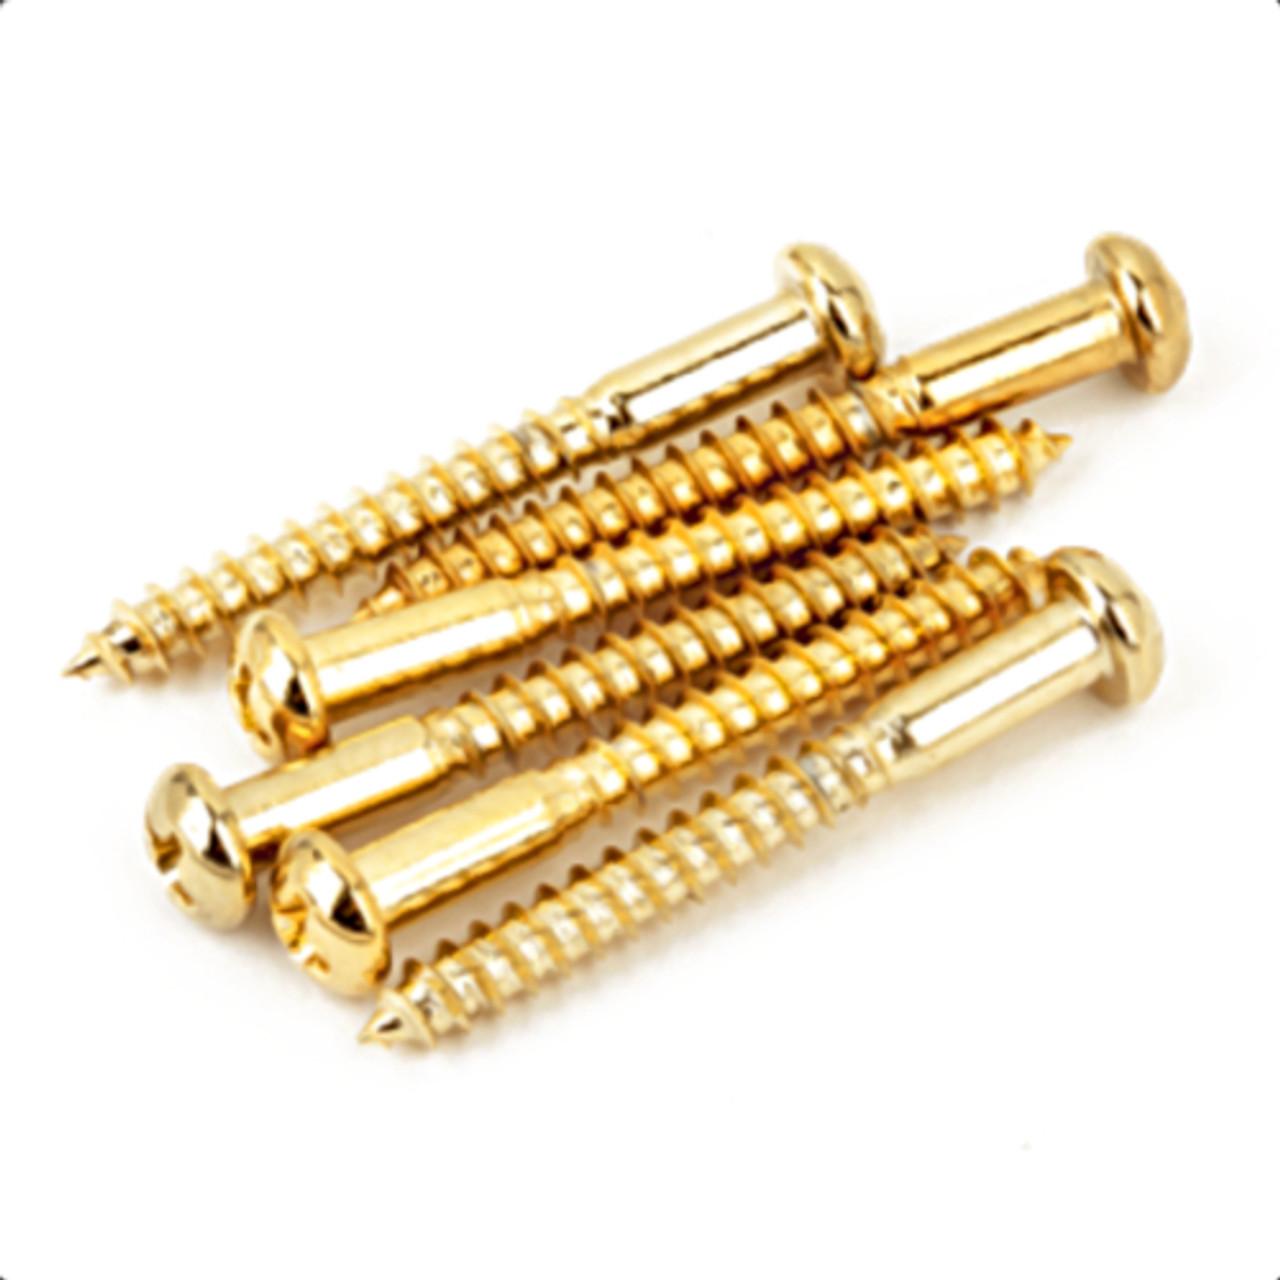 ender Vintage Strat Tremolo Bridge Mounting Screws-Gold